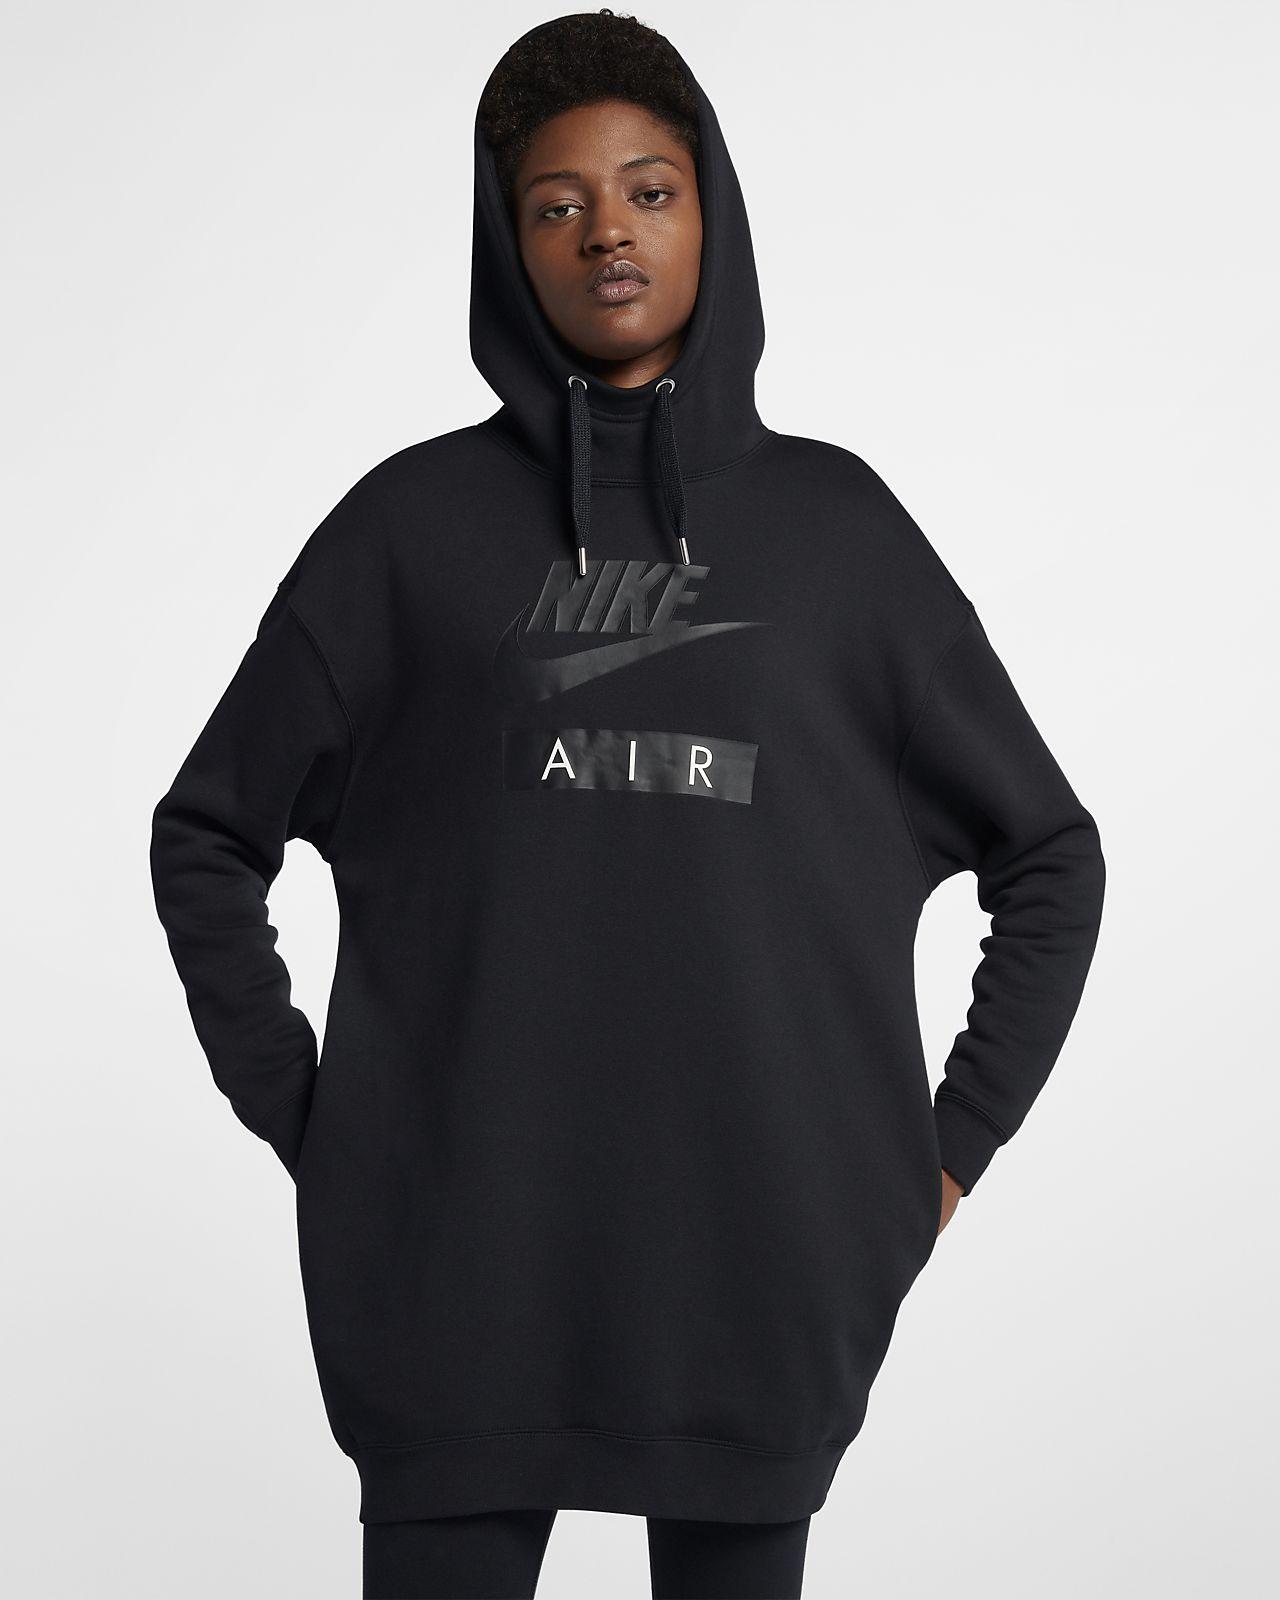 Vetement Shirt Nike Fitness Femme Et Mode Sweat O0vHPnTO